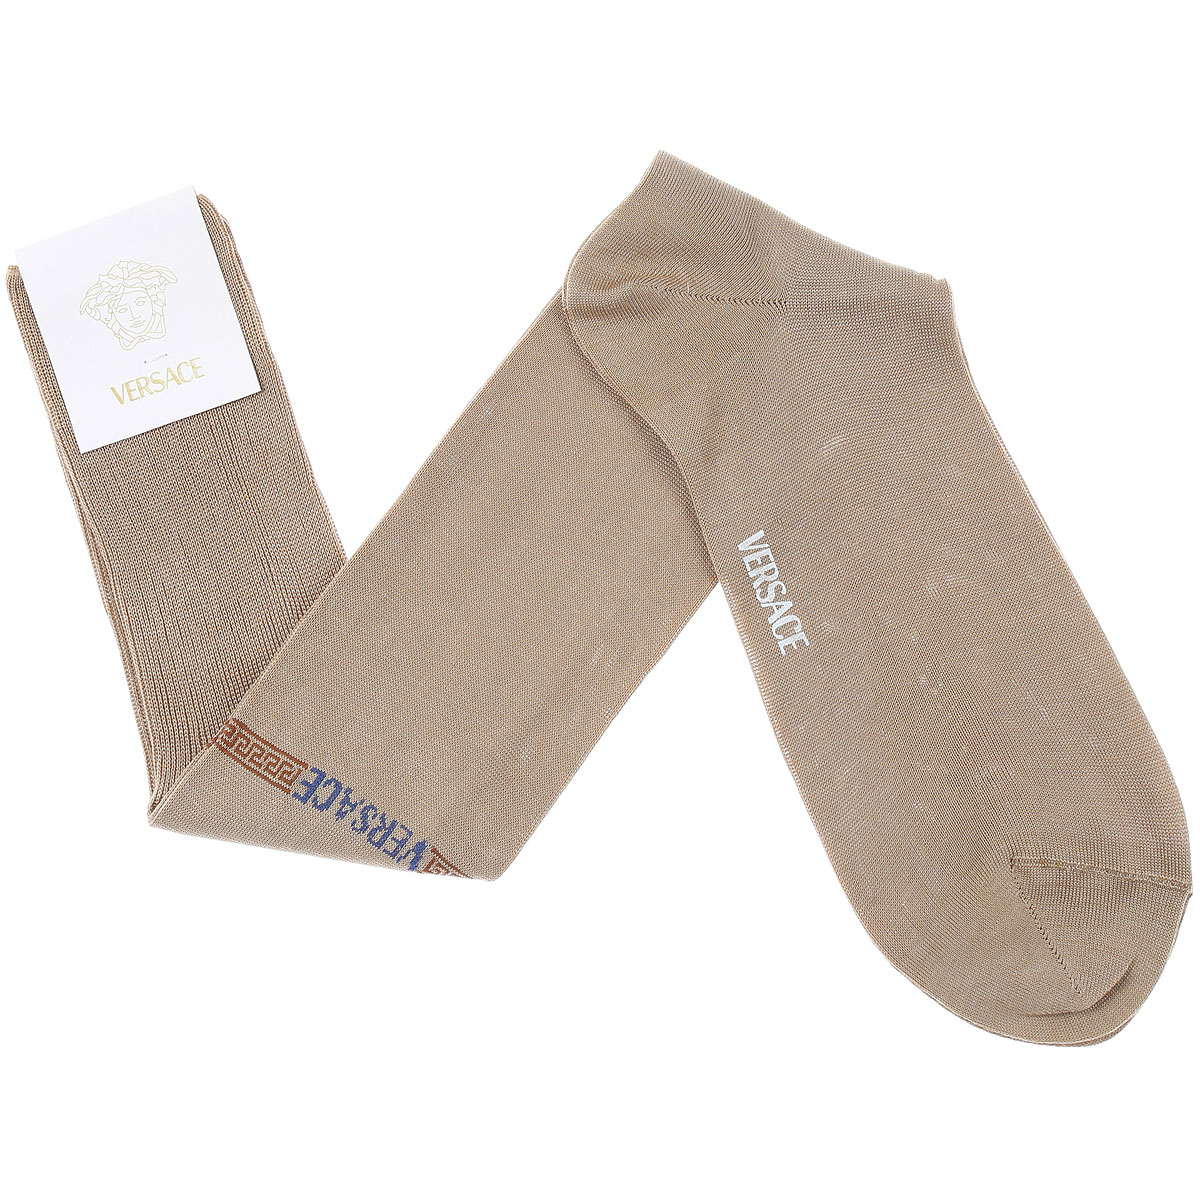 Versace Socks Socks for Men On Sale, Beige, Cotton, 2019, 12 (Shoe Size: EU 44 - US 10) 13 (Shoe Size: EU 45 - US 11)